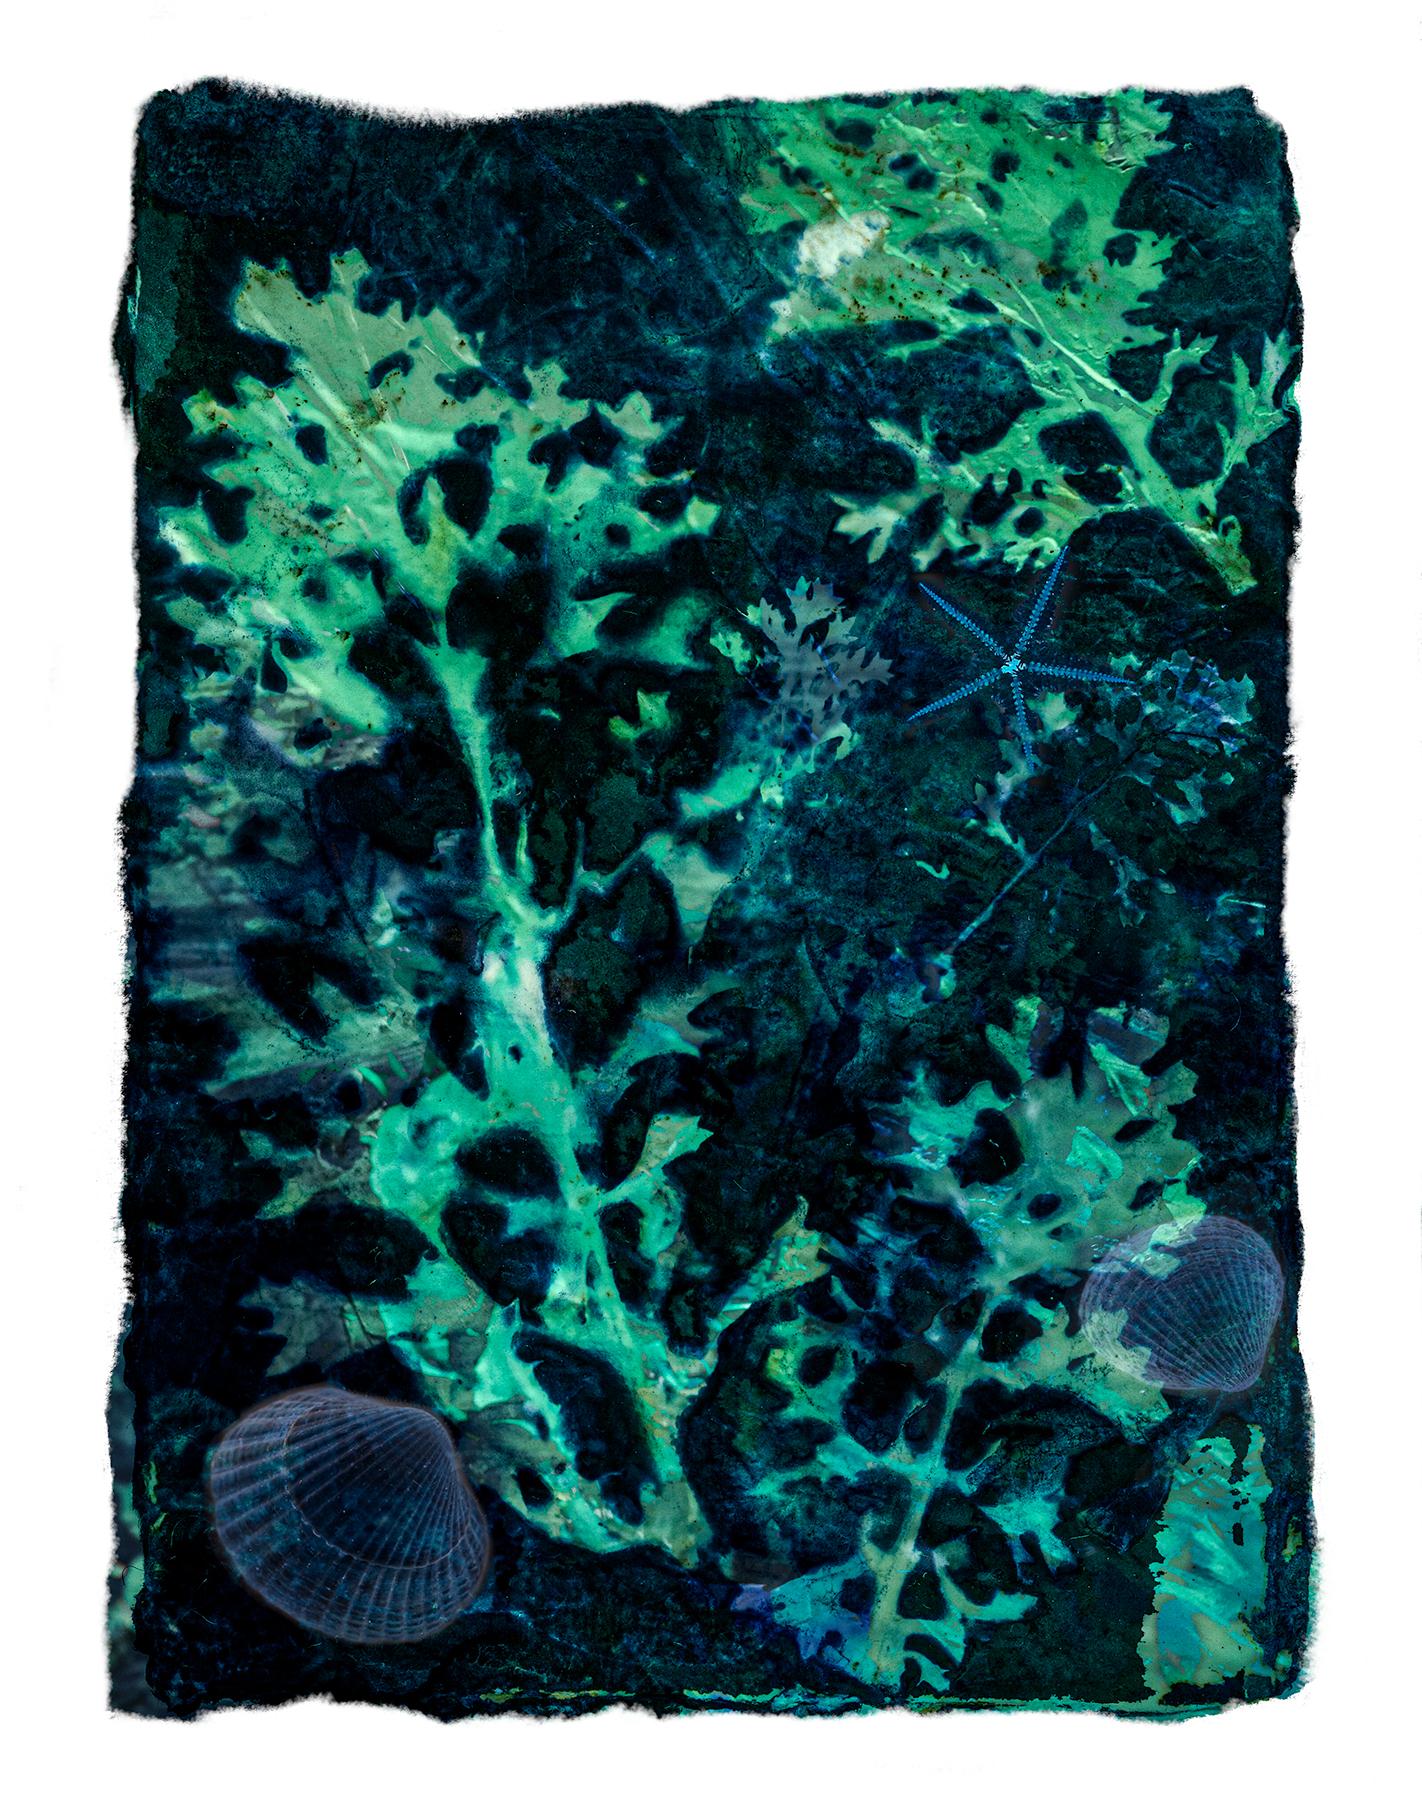 Deep Impressions, Ink & Lagoon